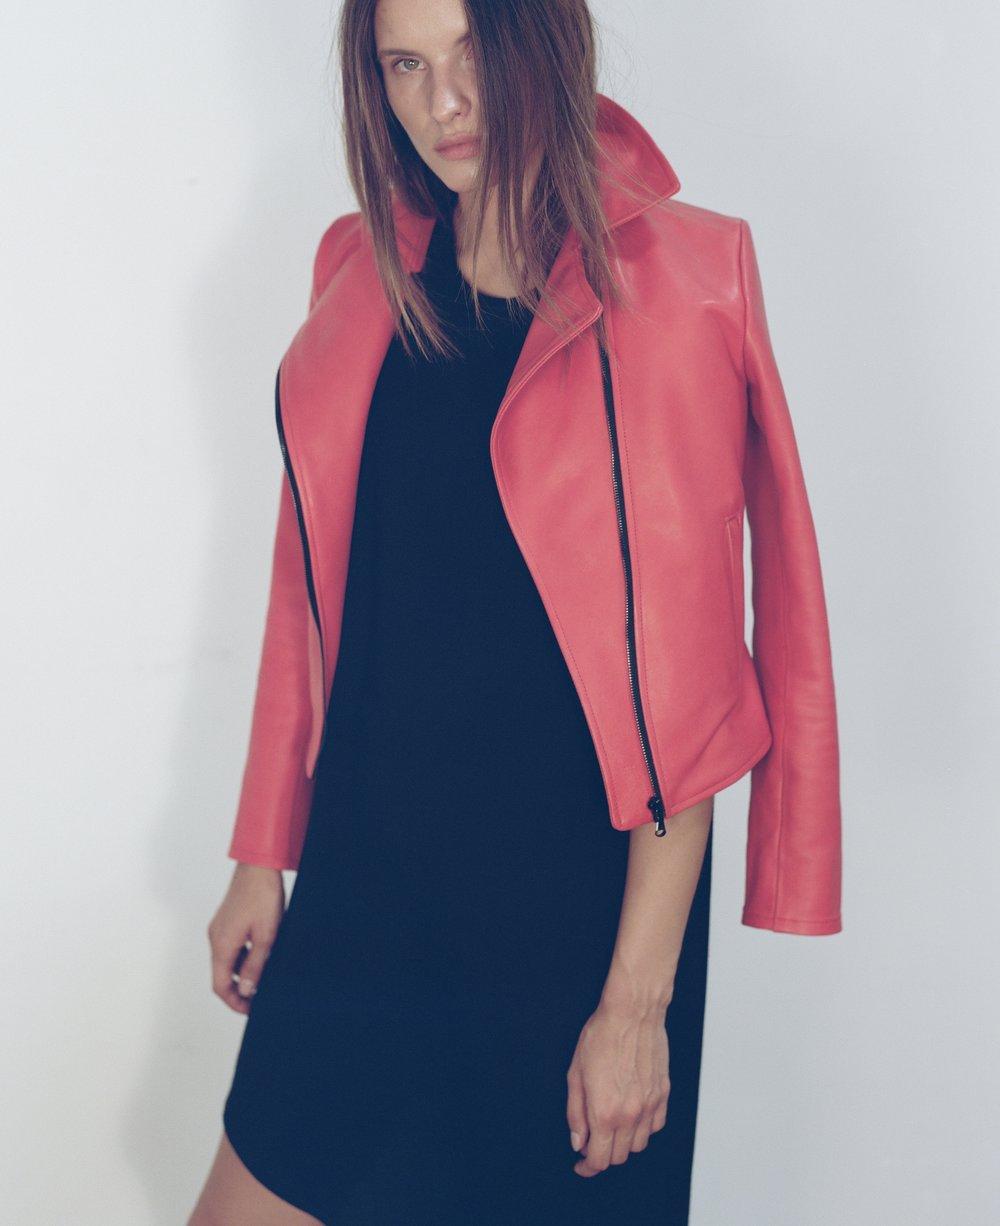 MF Atomic Red Blur Leather Jacket.jpg